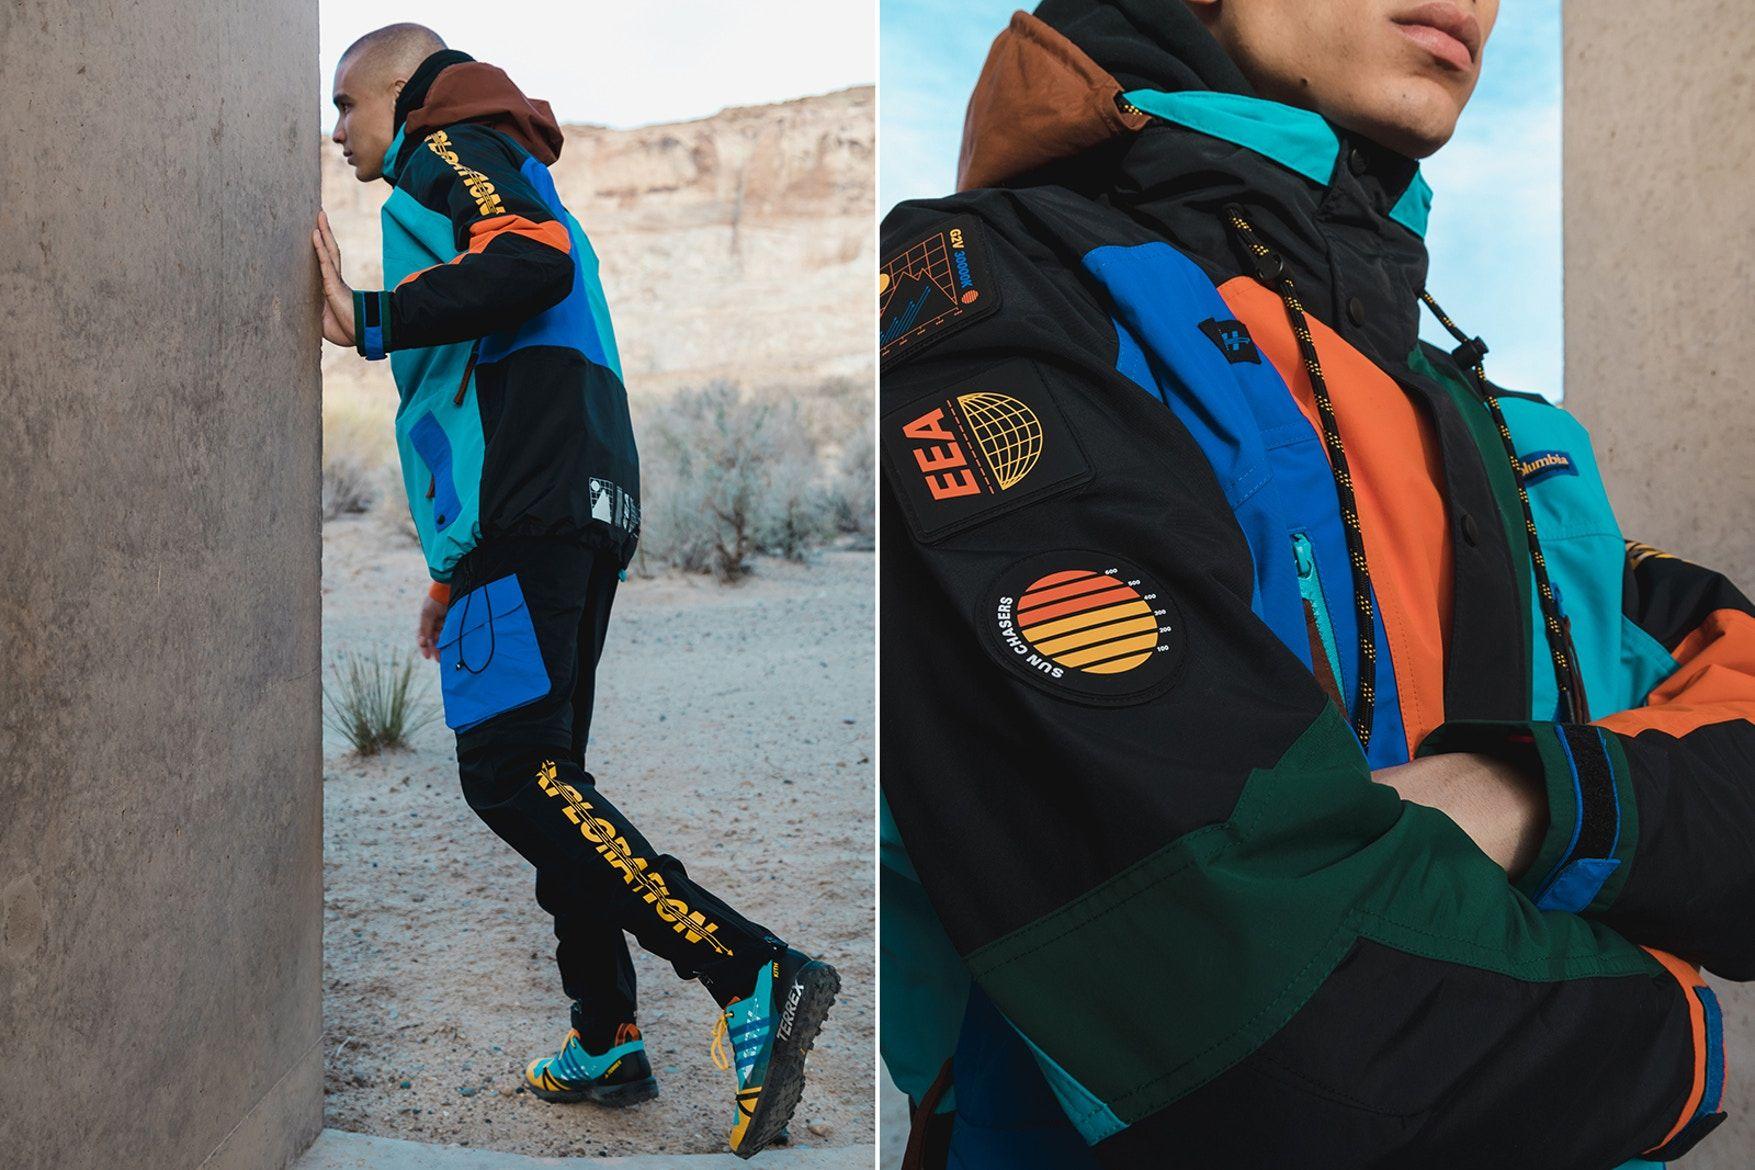 cc185c8c686 KITH Utah Collection EEA Element Exploration Agency fashion footwear  accessories 2018 Columbia Sportswear adidas TUMI Oakley G Shock Ronnie Fieg  release ...